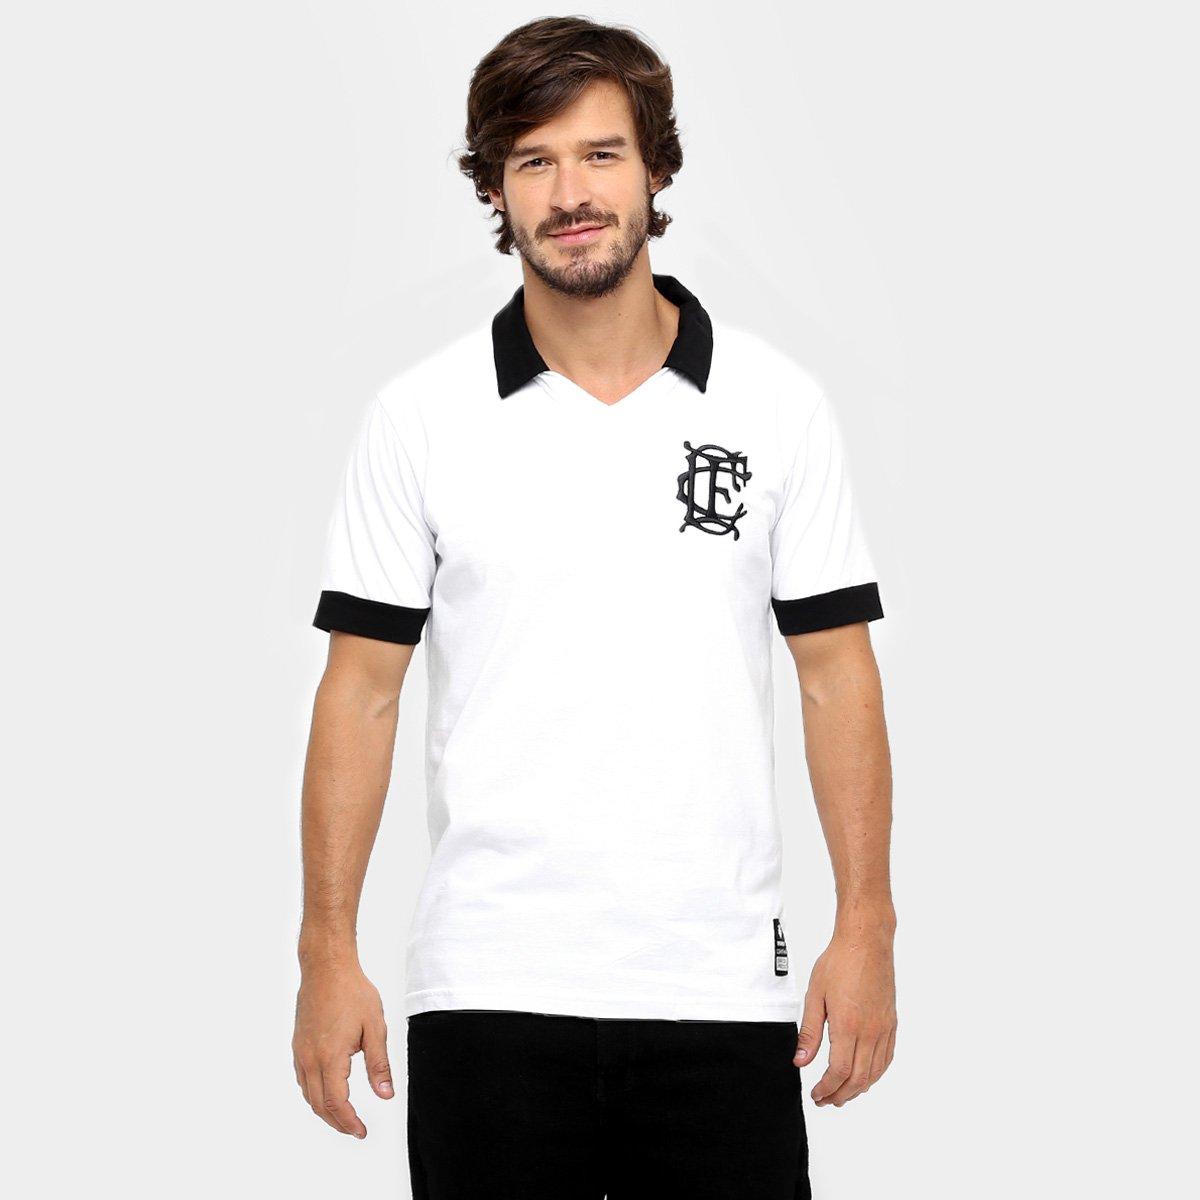 Camisa Polo Corinthian-Casuals Retrô Masculina - Tam: P